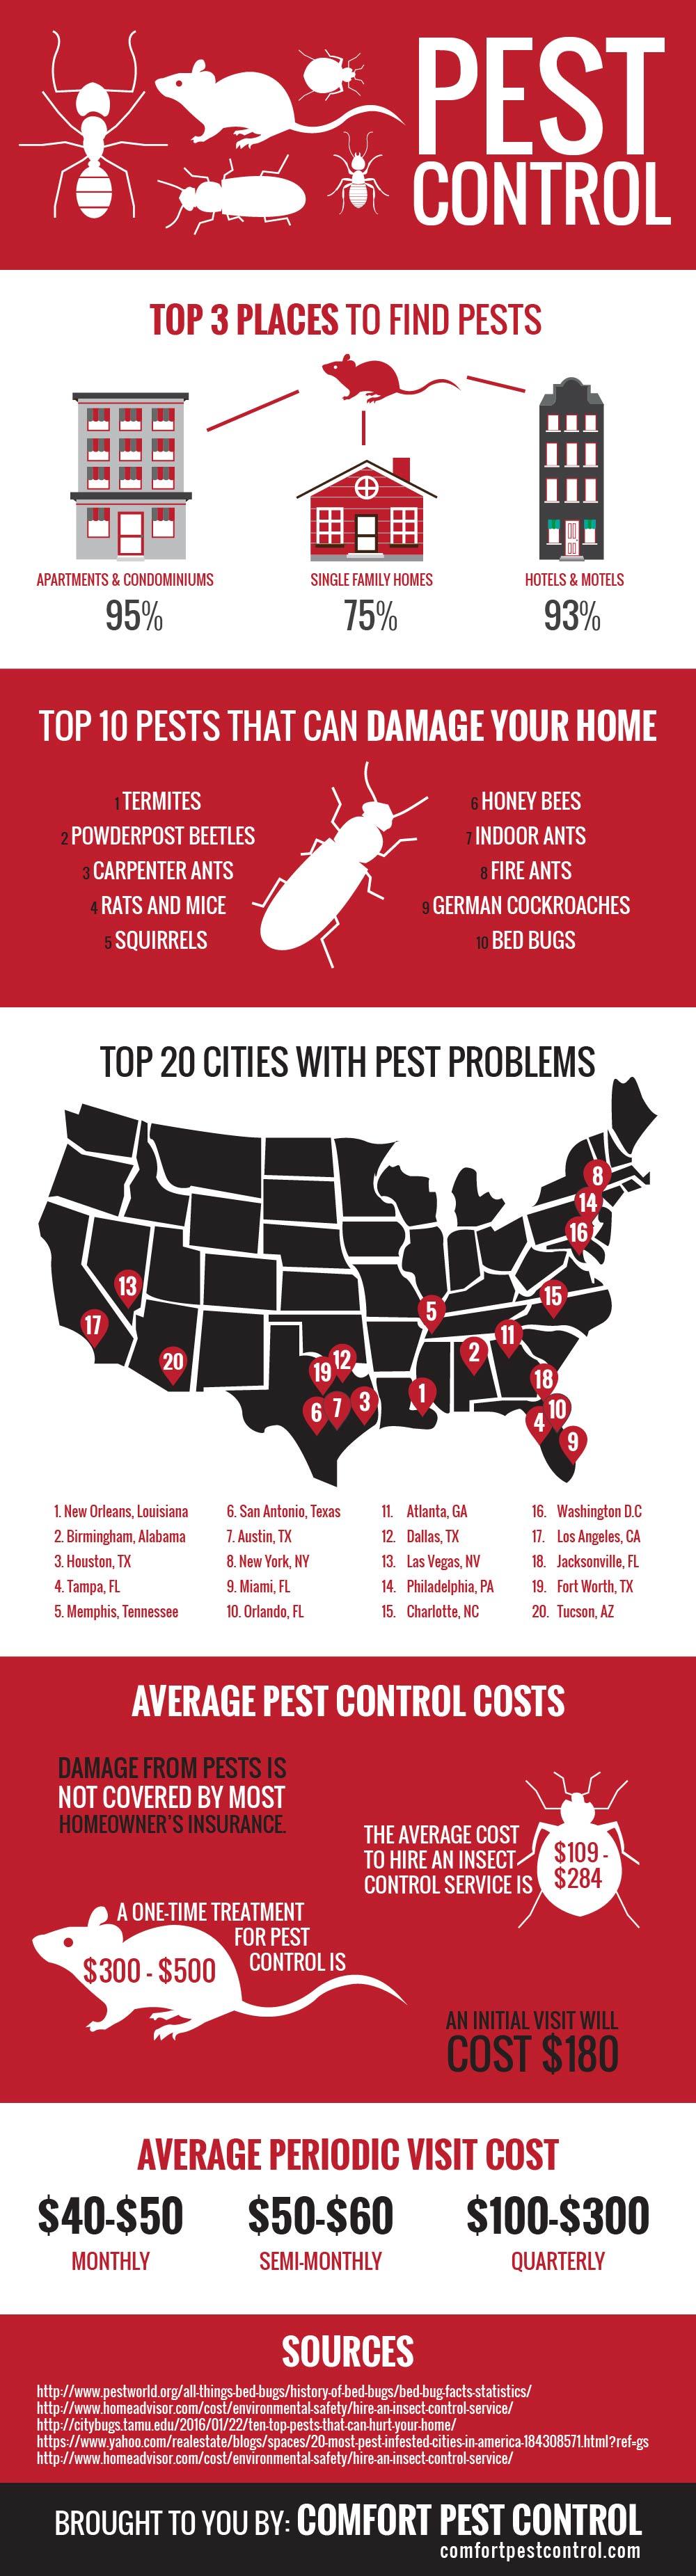 pest-exterminator-infographic-01.jpg